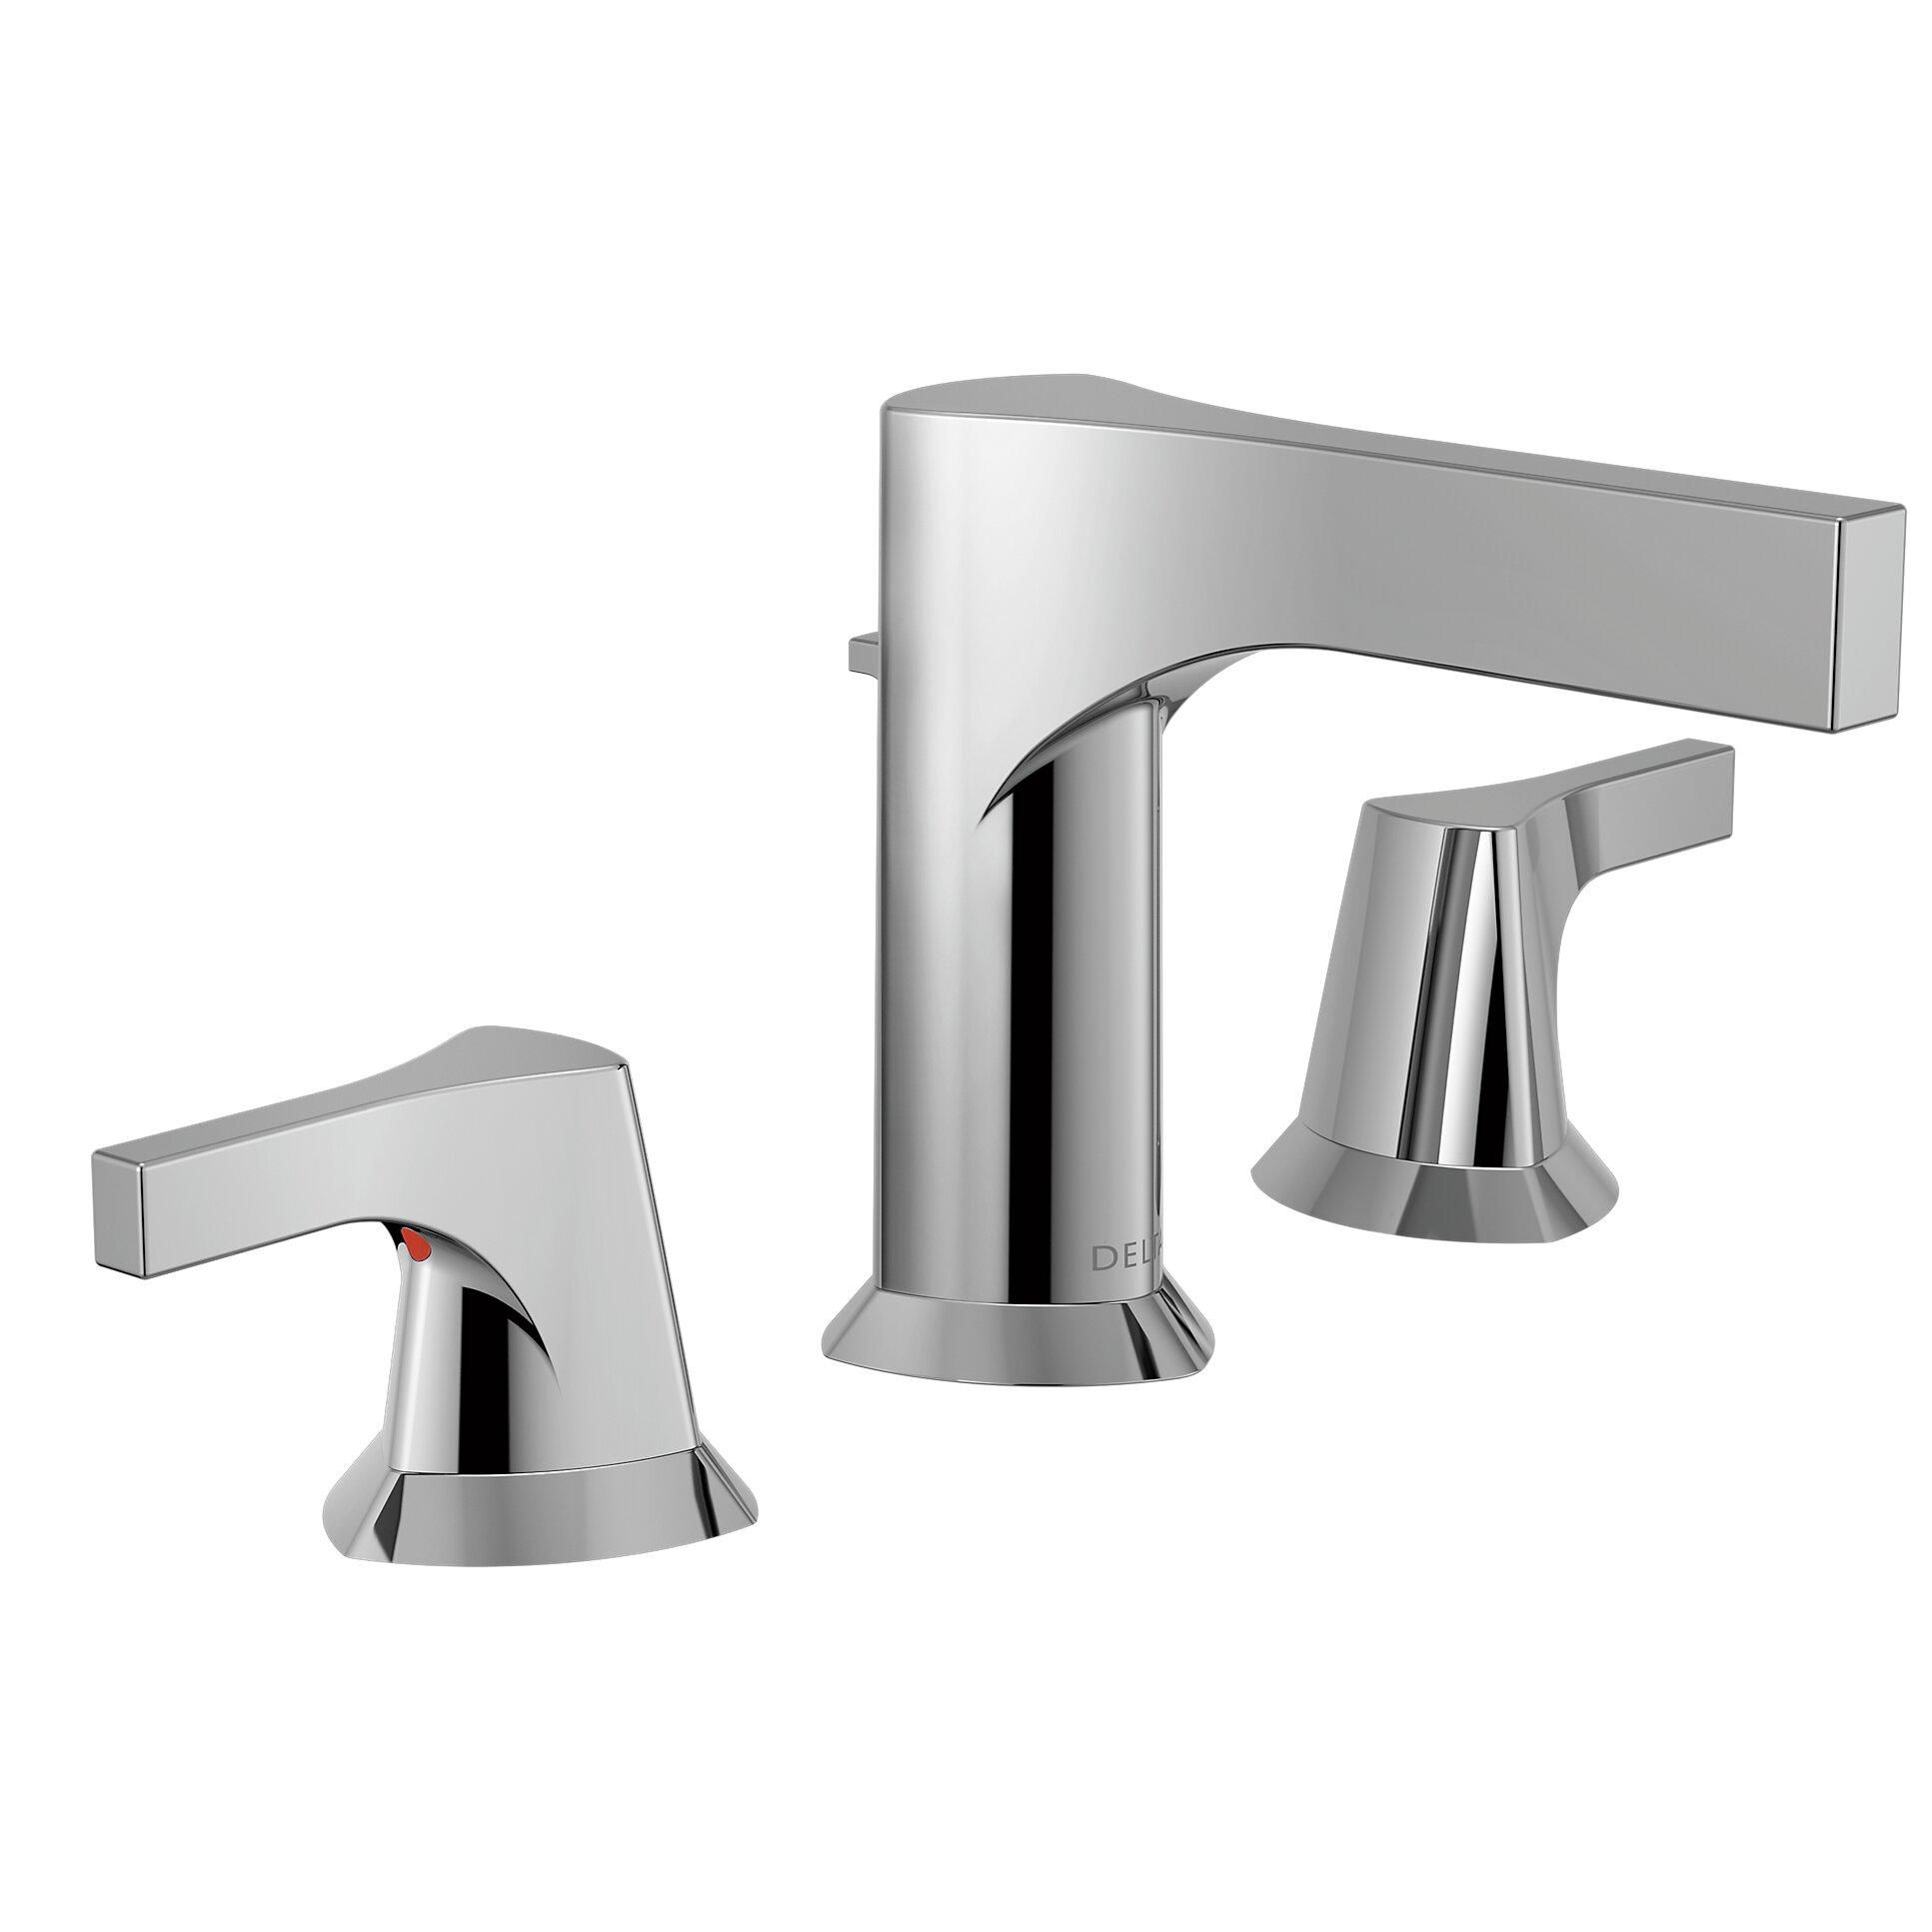 Cross Handle Bathroom Faucet Delta Zura Double Handle Widespread Bathroom Faucet With Drain